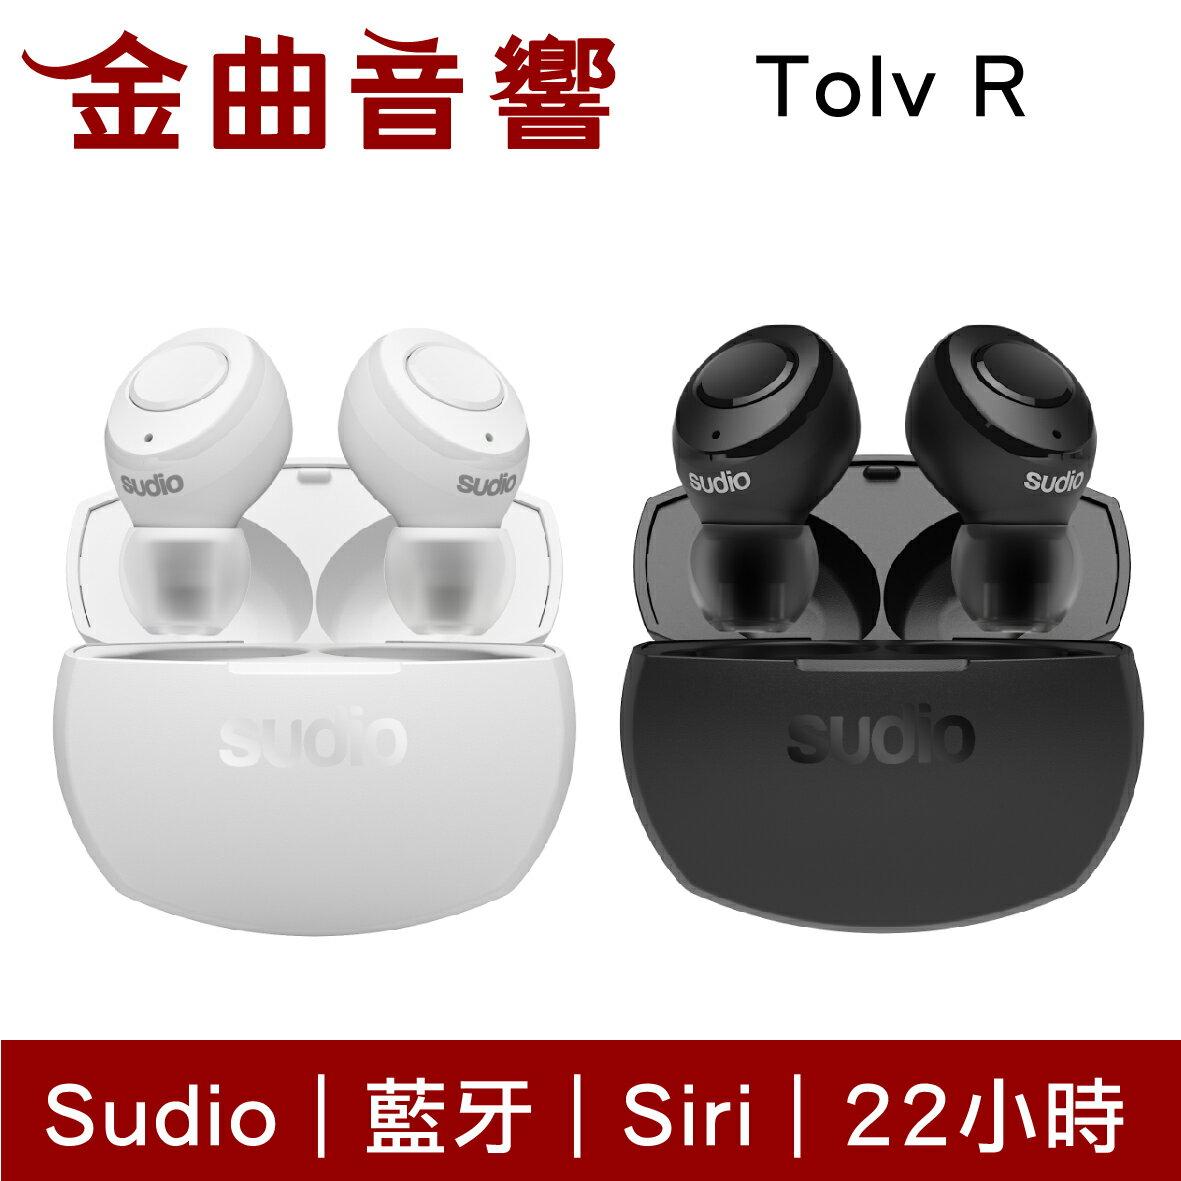 Sudio Tolv R 黑白兩色 真無線藍牙耳機 可通話 輕巧 語音助理 TolvR | 金曲音響